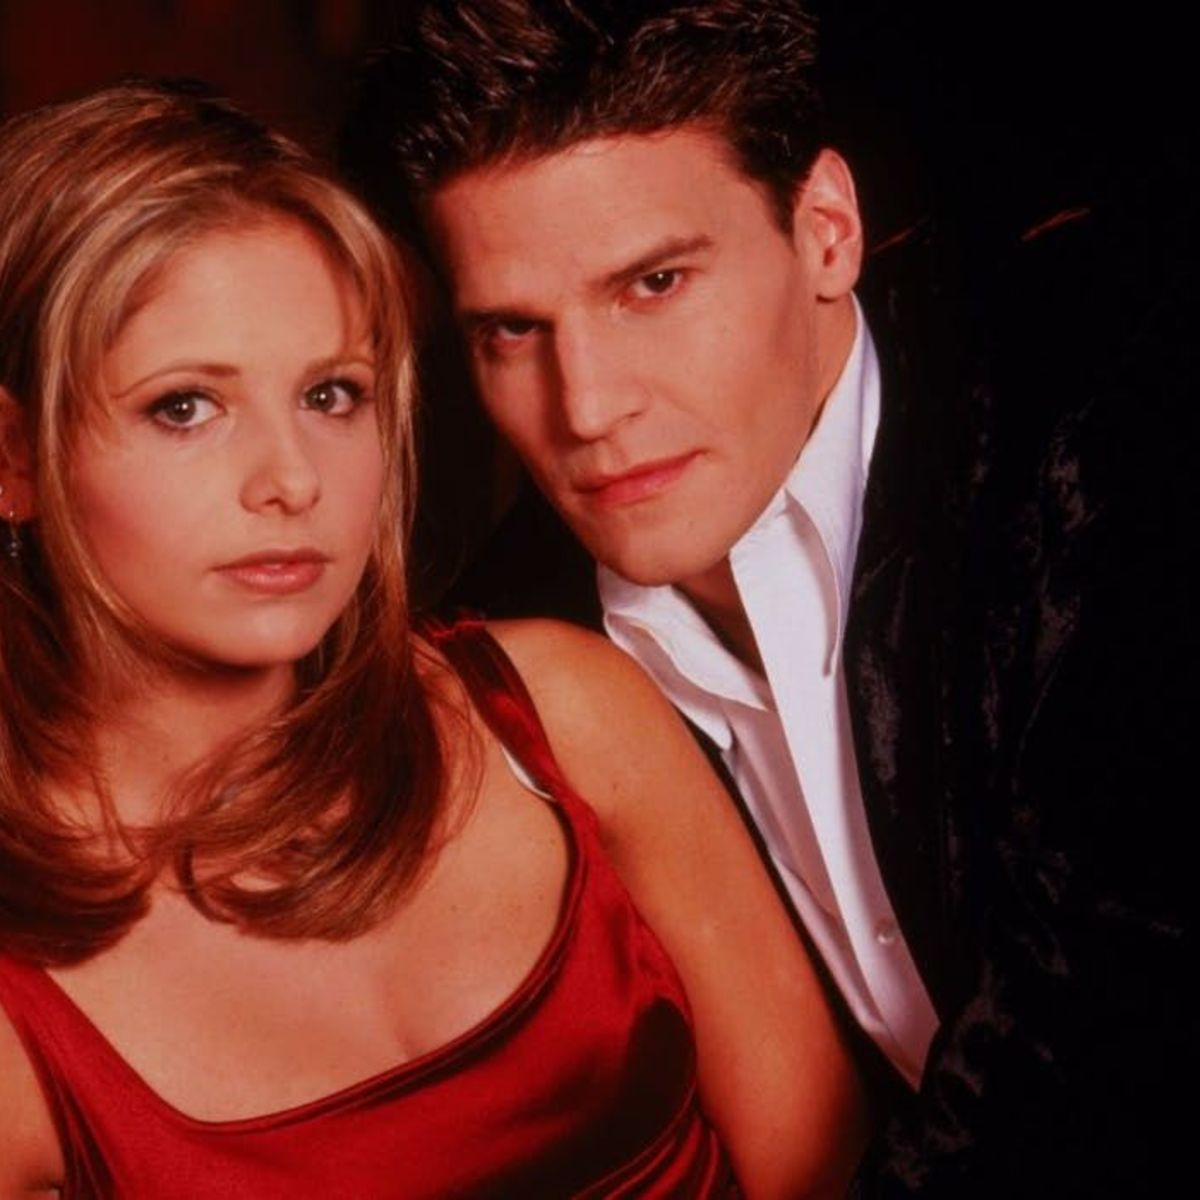 Amusing opinion Buffy and angel adult fan fiction